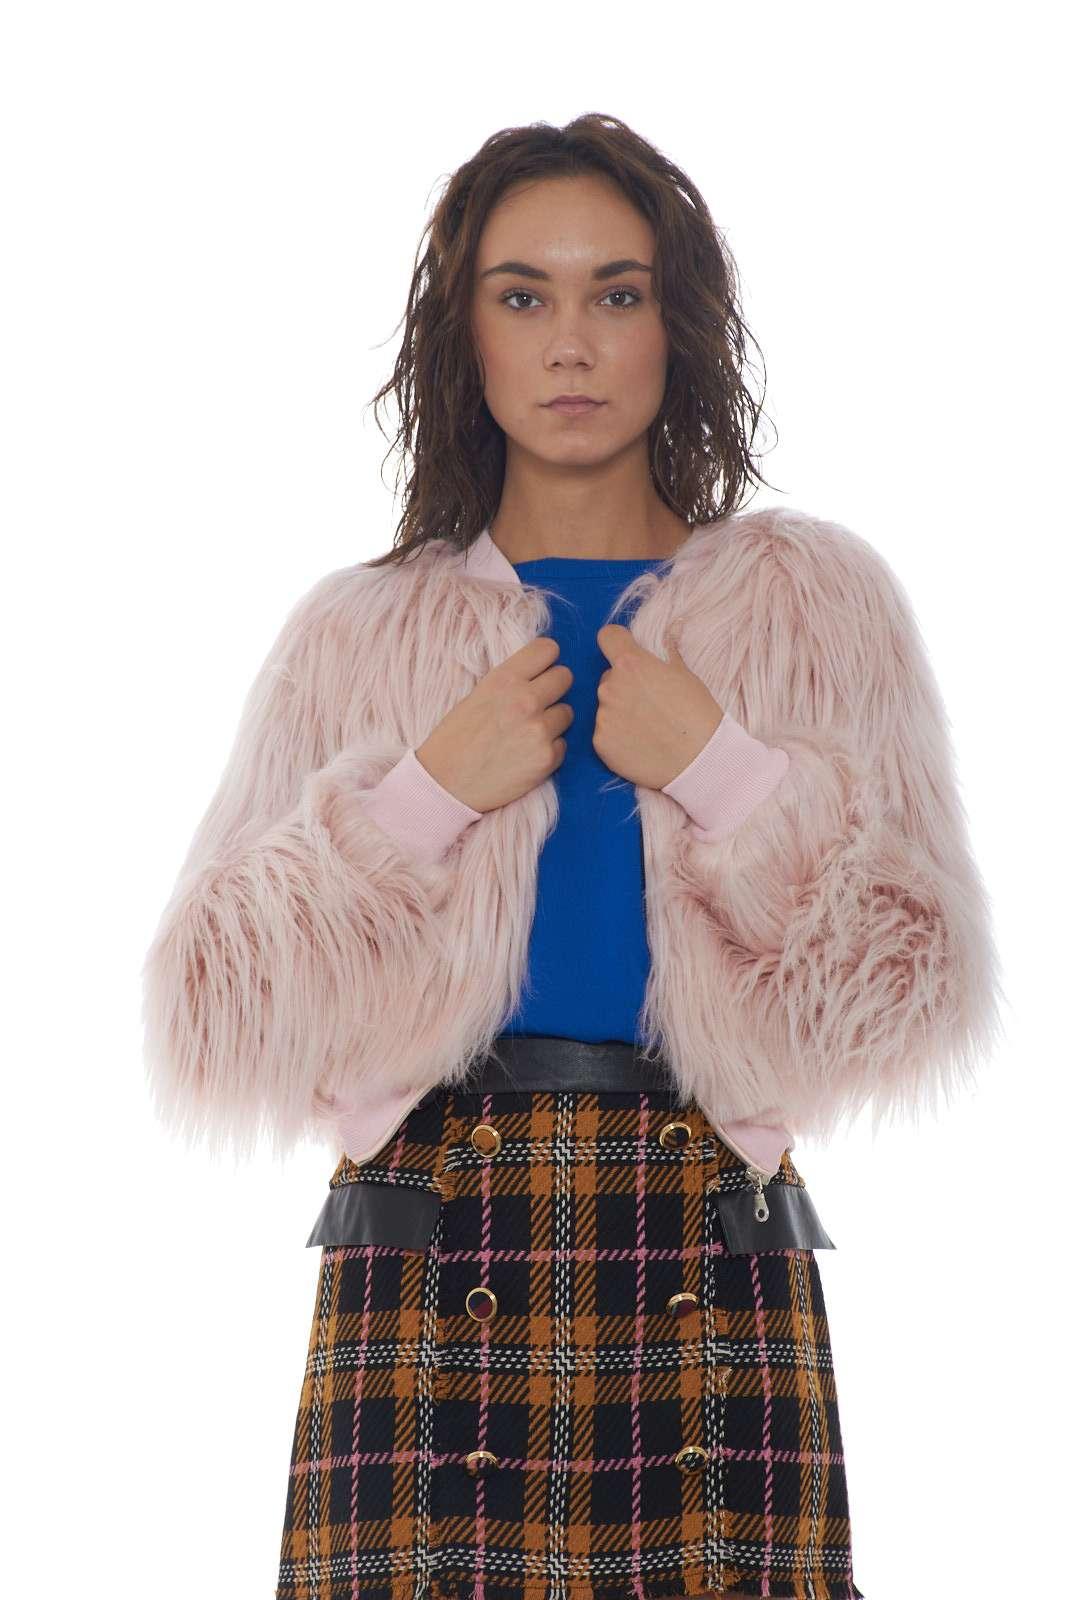 https://www.parmax.com/media/catalog/product/a/i/AI-outlet_parmax-giacca-donna-Jaim%C3%A8-8762jPe-A.jpg